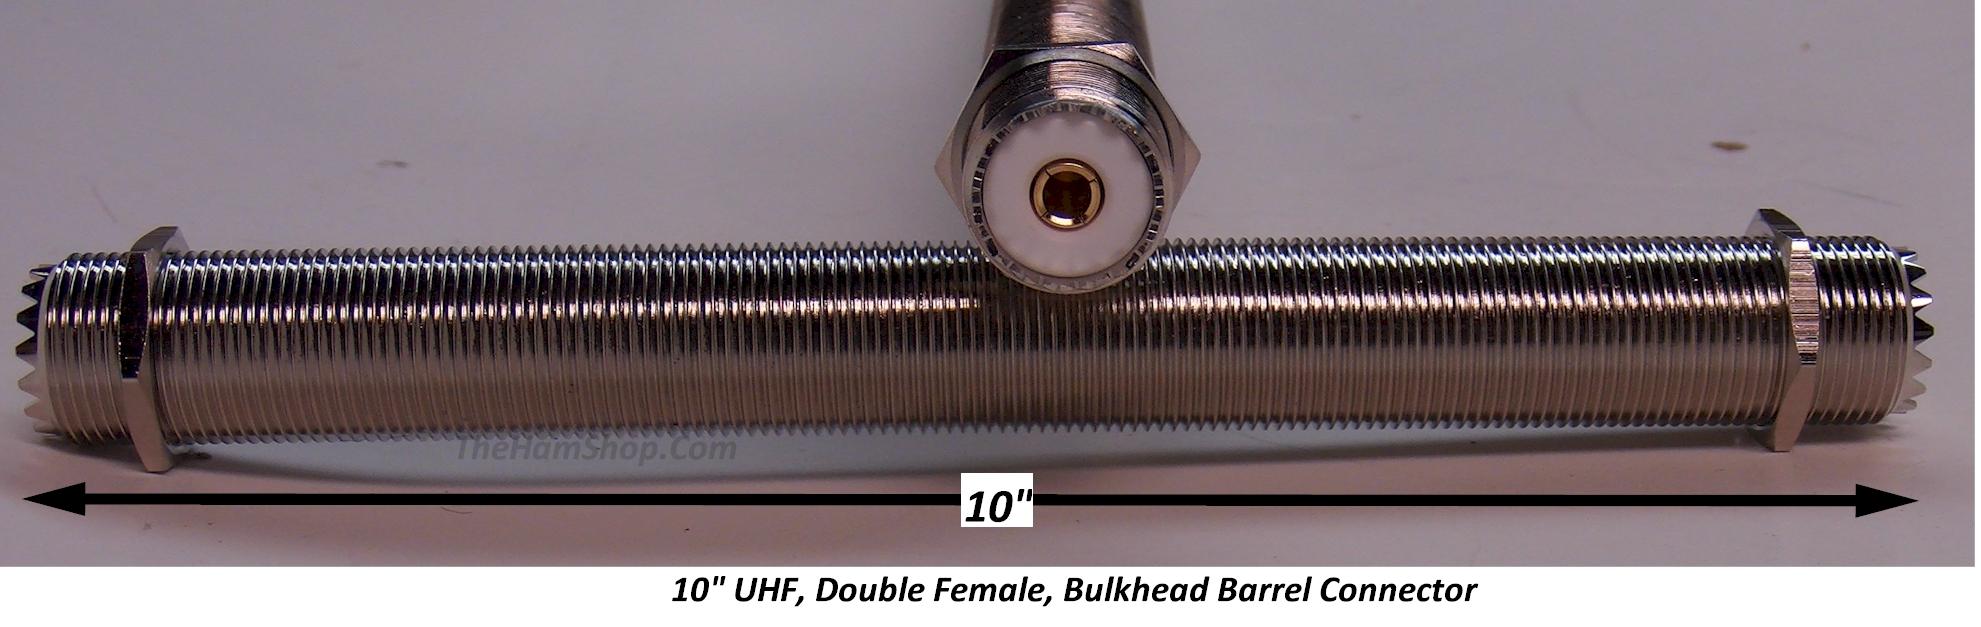 Uhf double so female bulkhead barrel connector